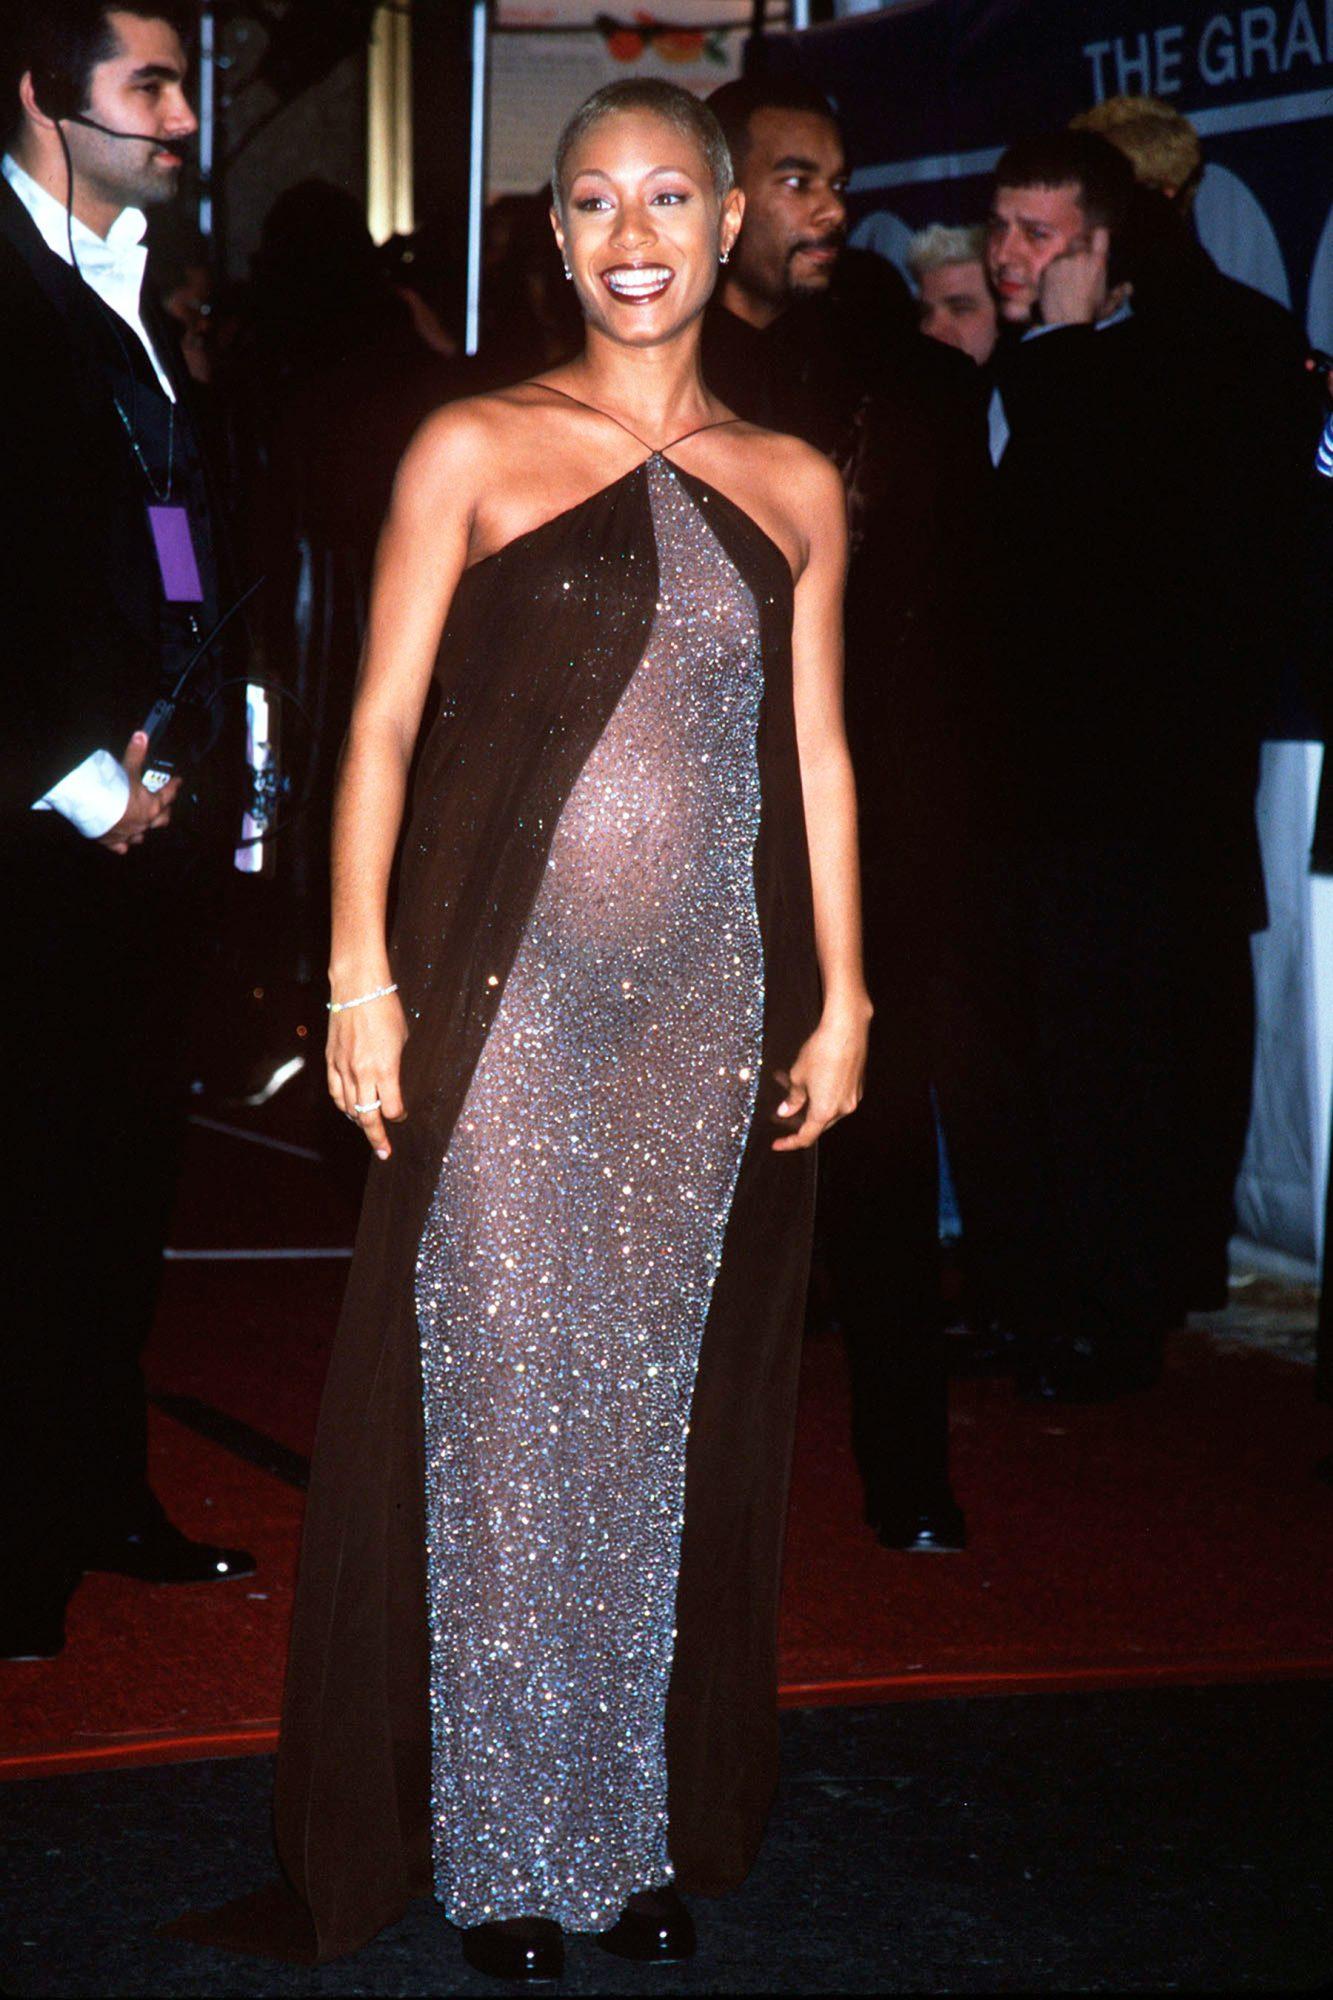 Jada Pinkett seen here pregnant, arrives at the Grammy Awards